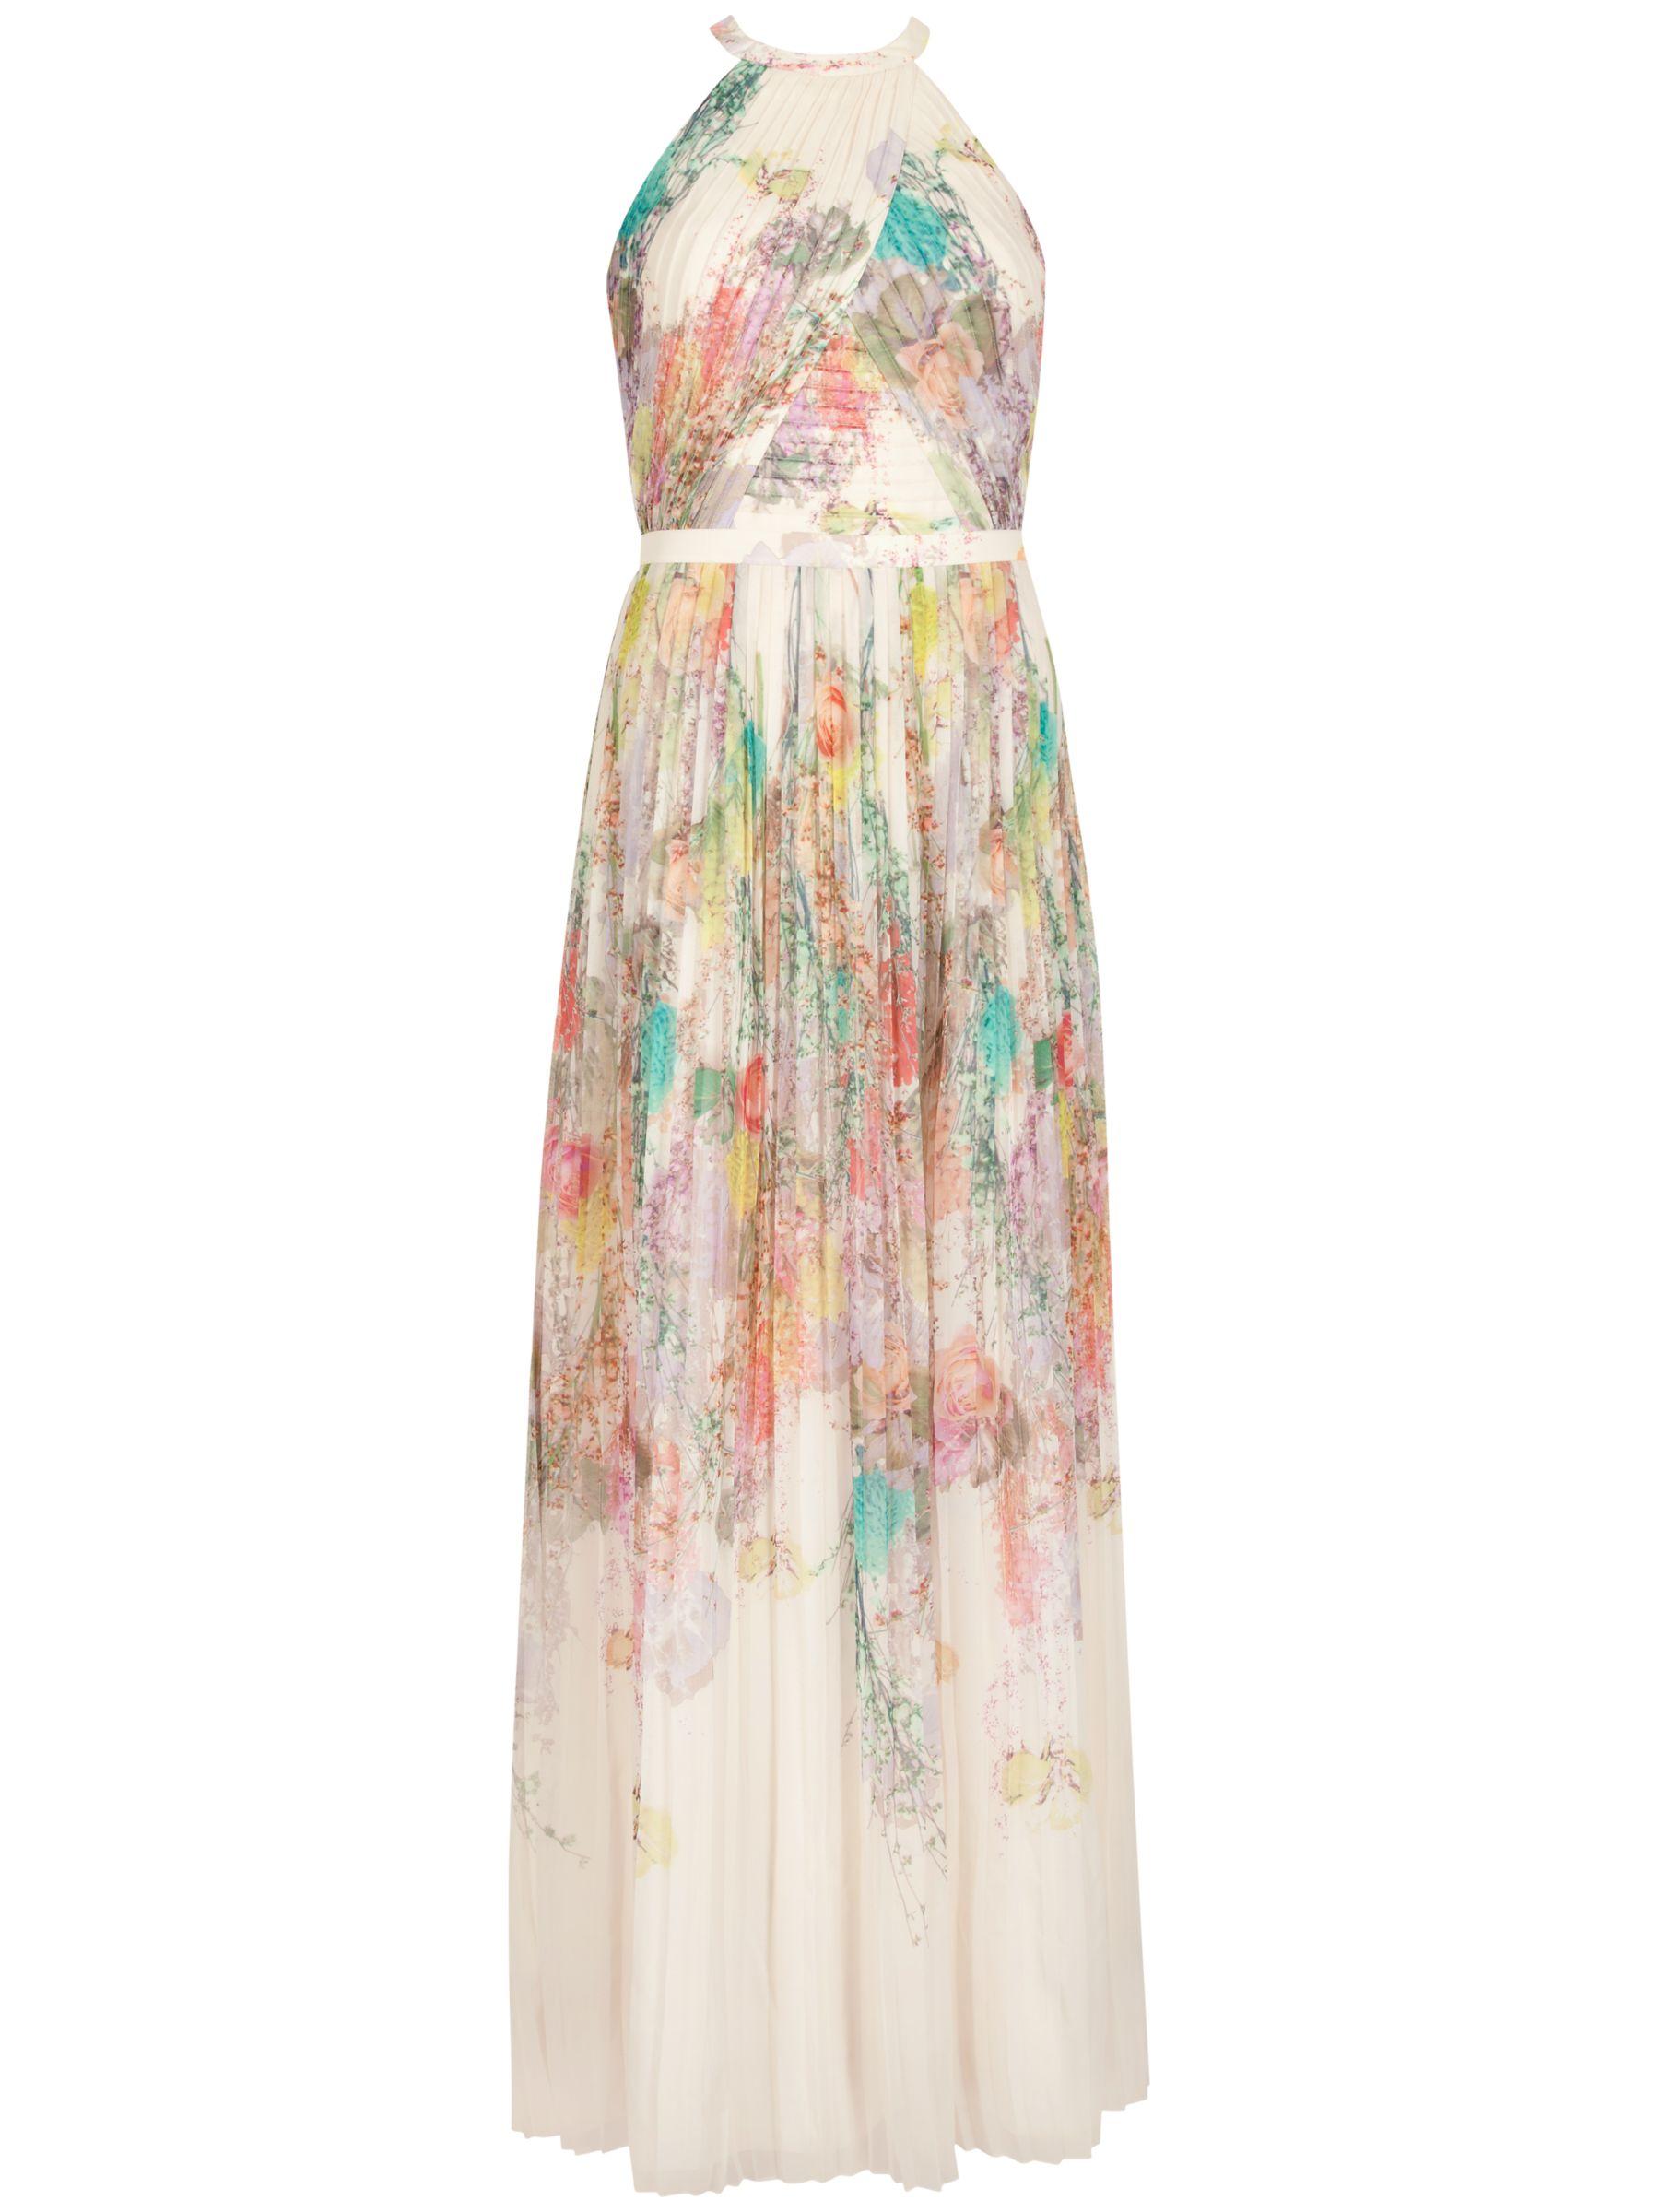 John Lewis Plus Size Dresses Choice Image Prom Dress Ideas 2018